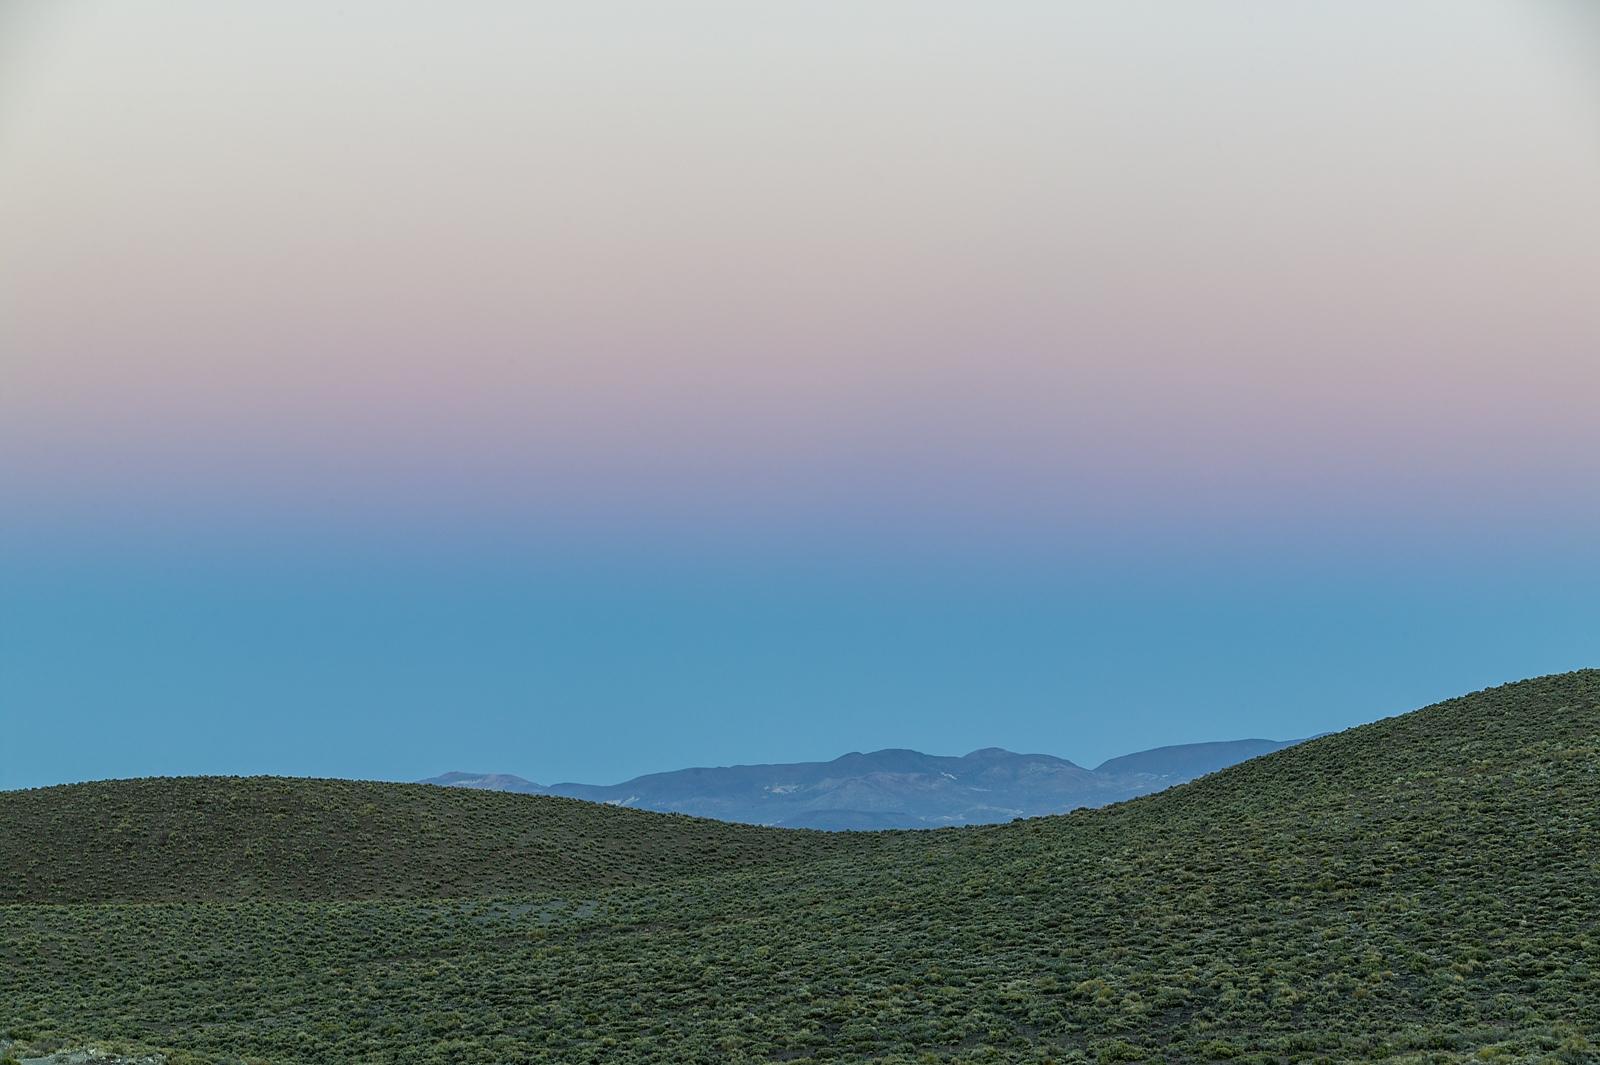 Nevada Scenic Landscape 806V6797 rte 264 Vcnty Boundry Peak